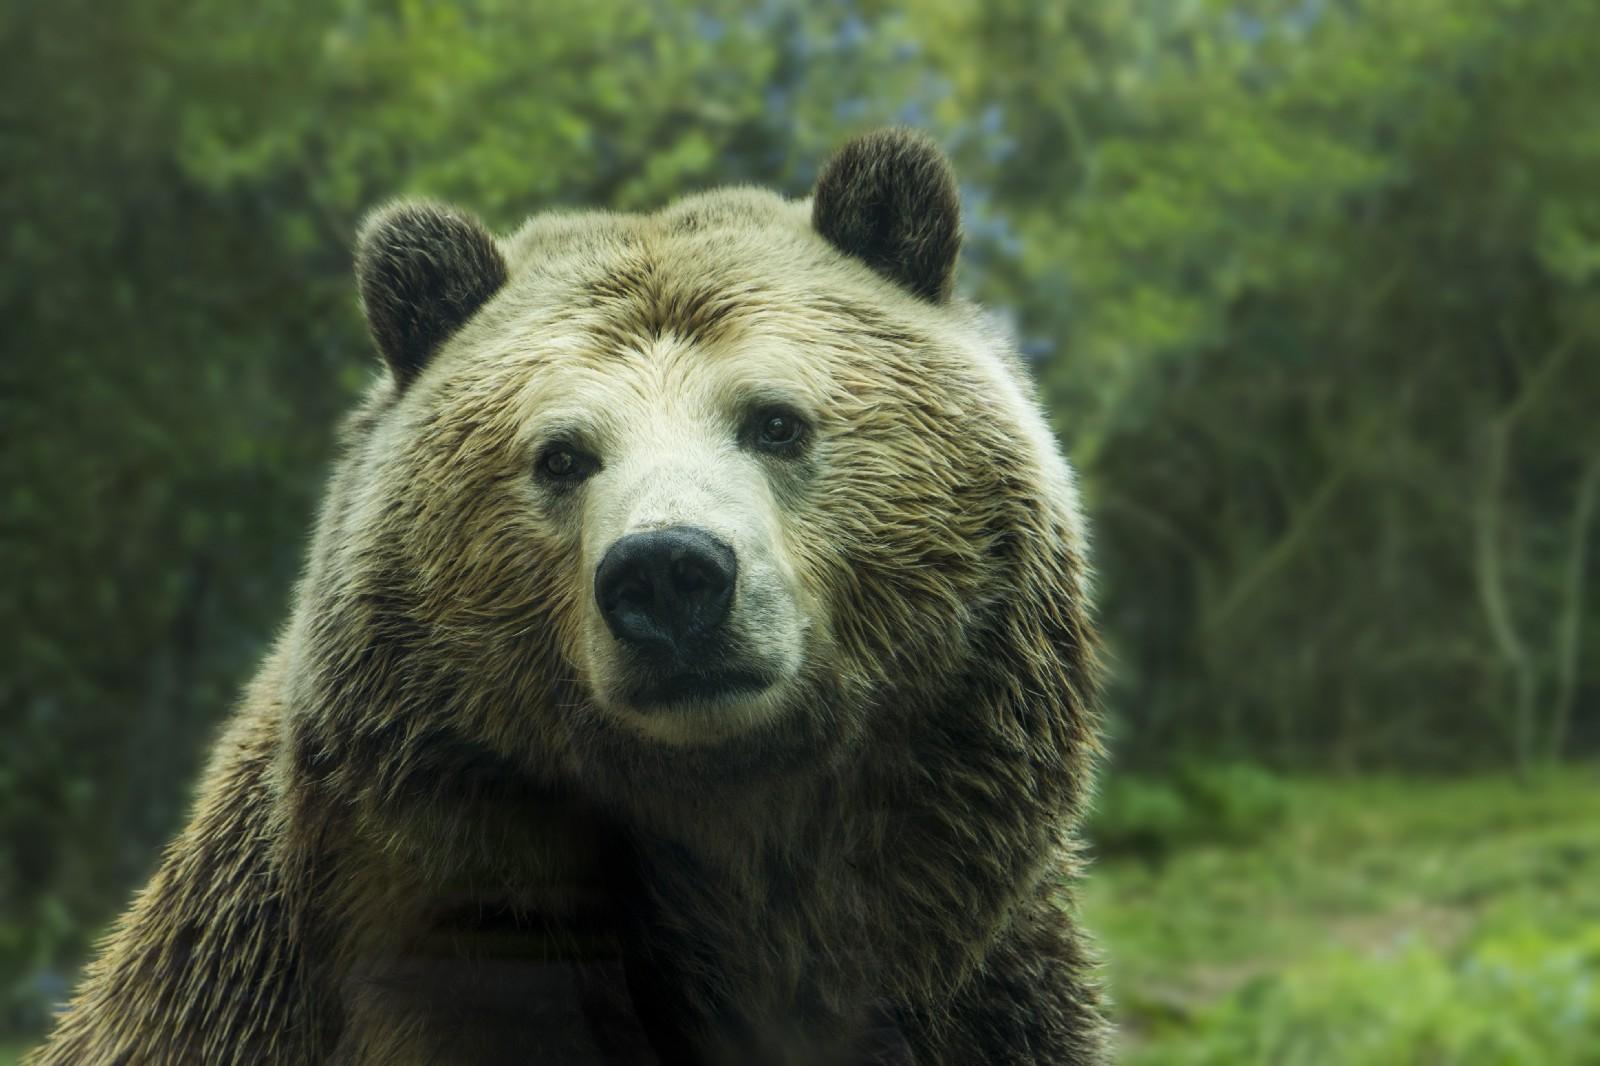 /why-the-crypto-bear-market-will-continue-59b0da25f10a feature image